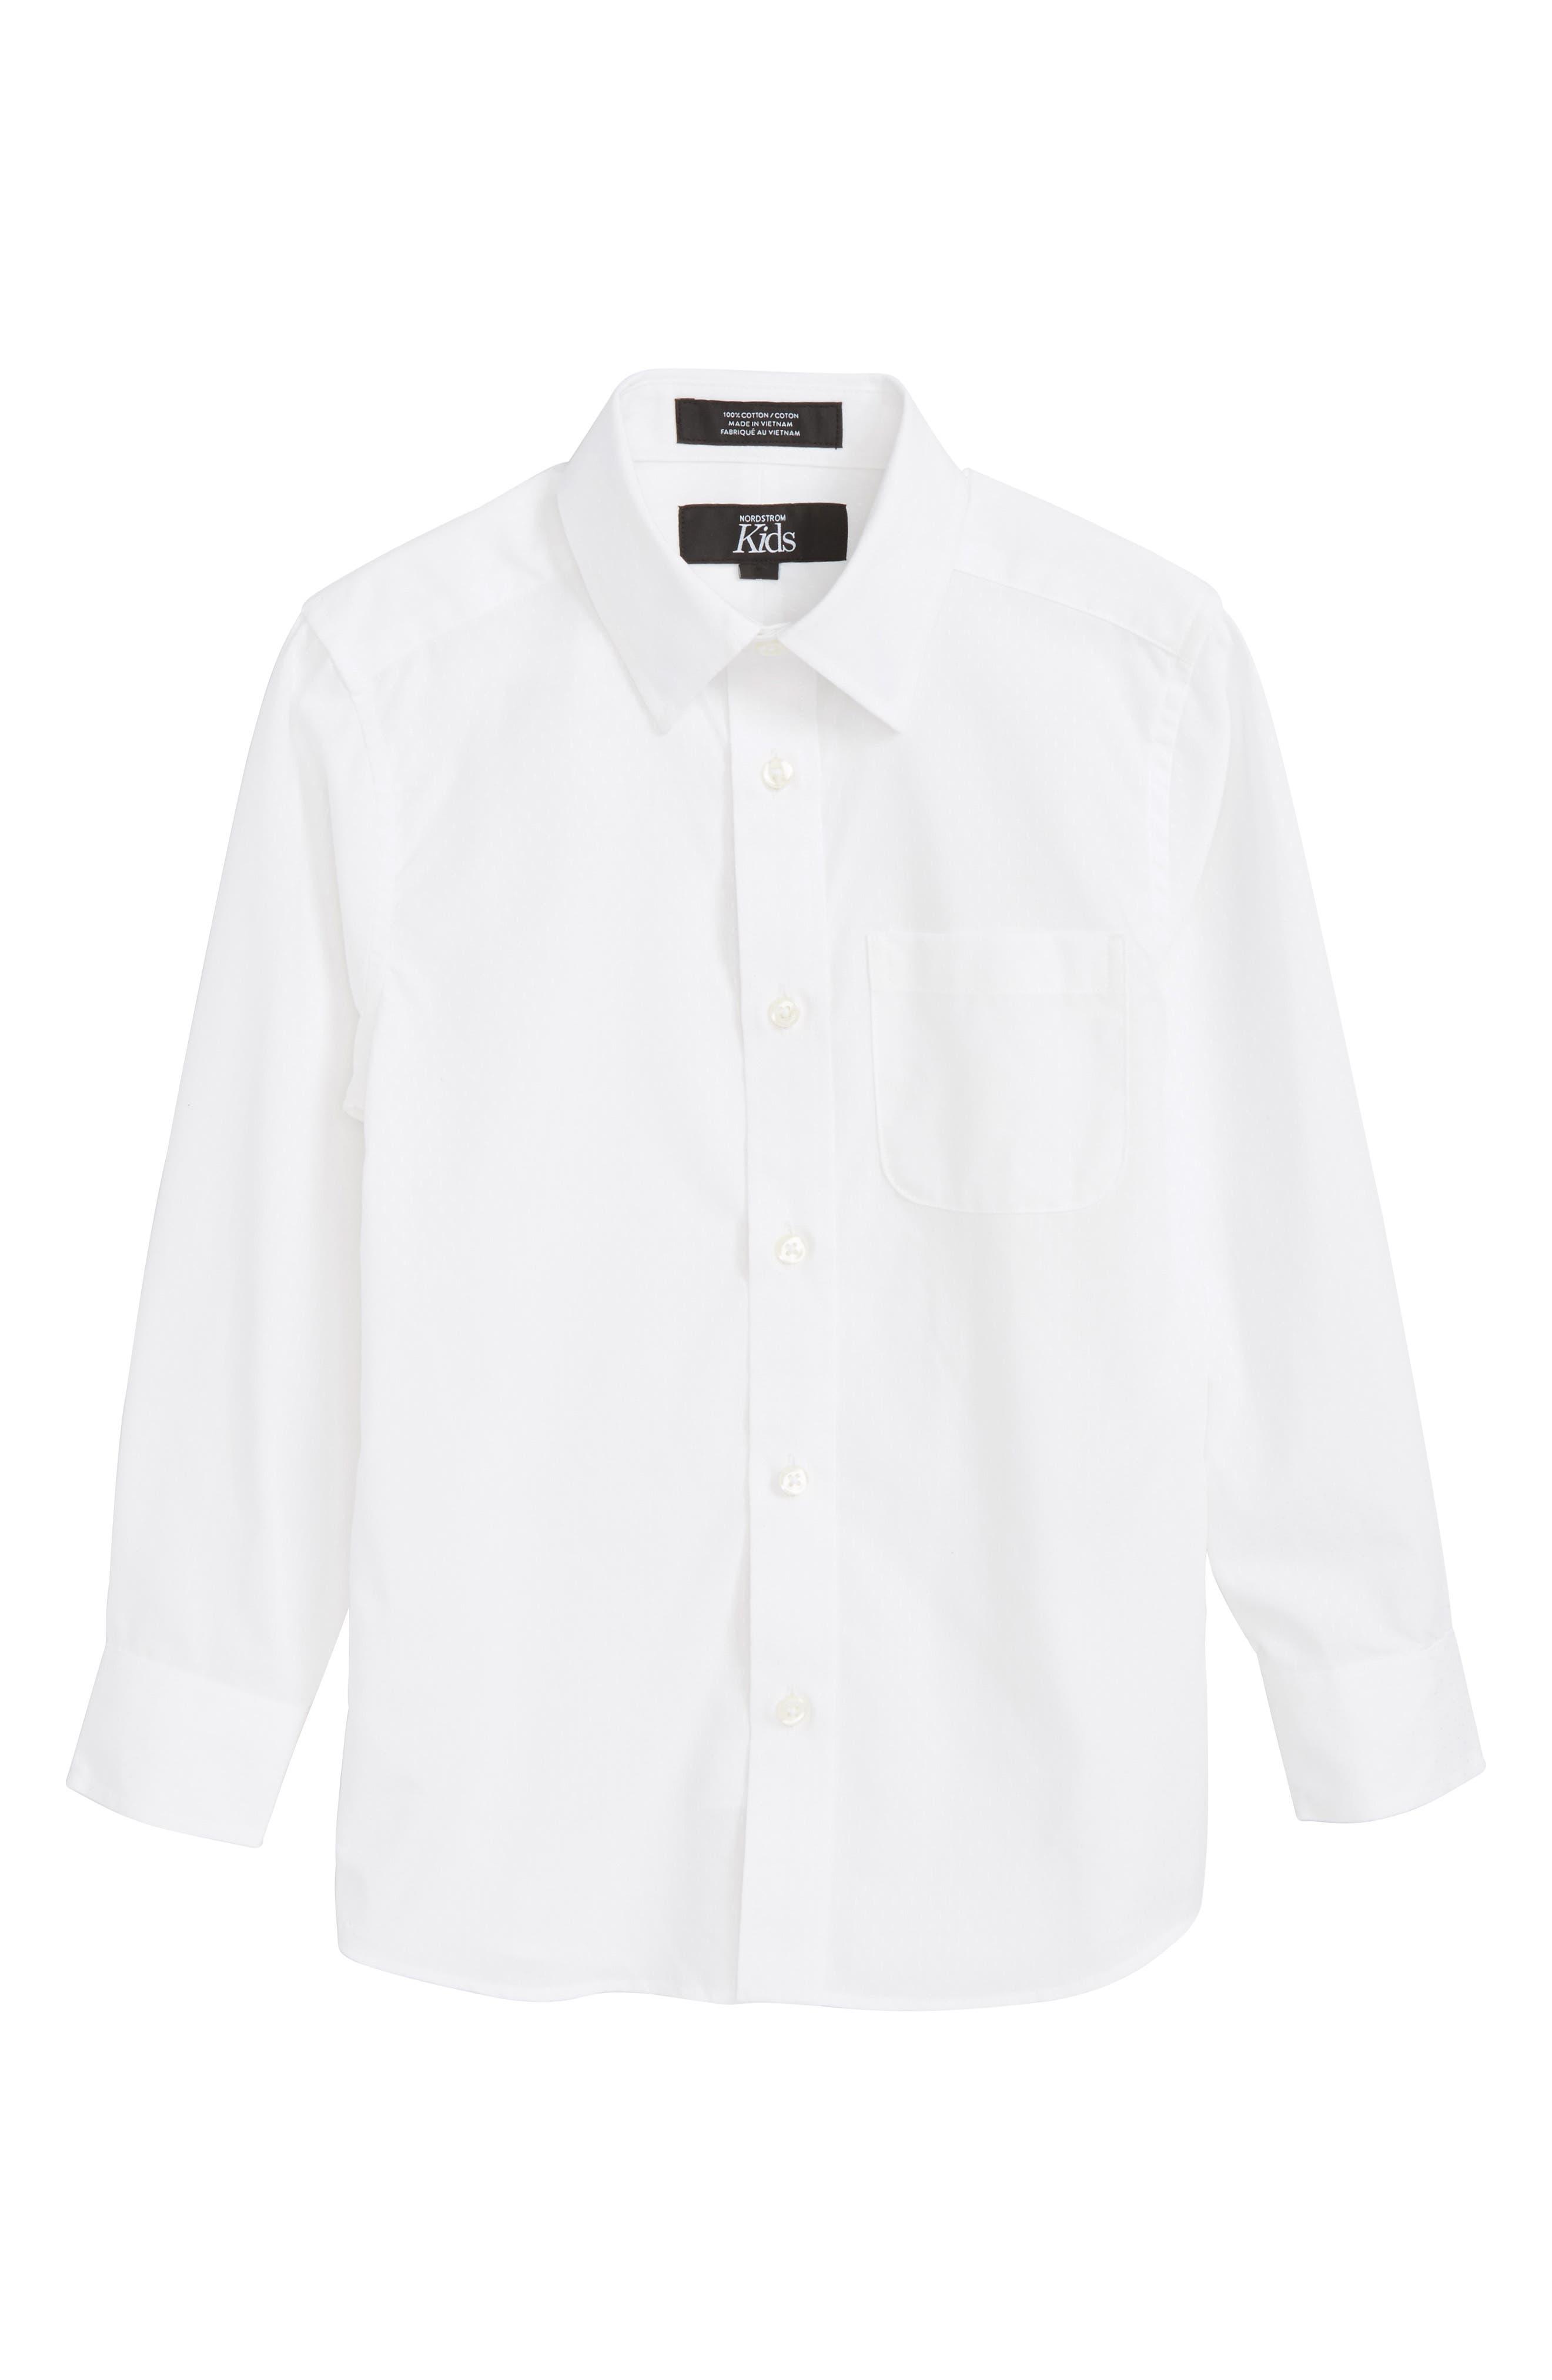 White Dobby Sport Shirt,                             Main thumbnail 1, color,                             White Dobby